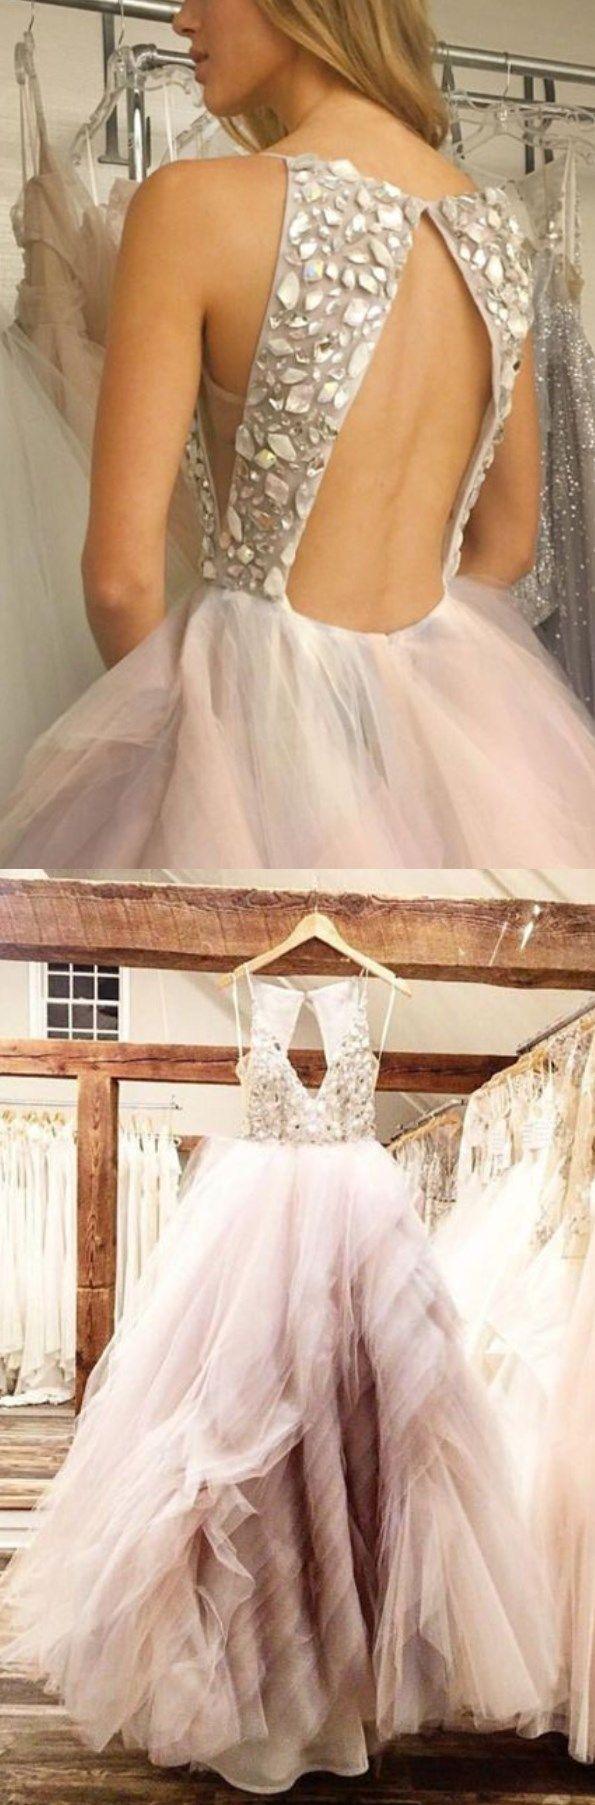 Long sleeves prom dresses,sexy prom dresses,elegant prom dress,open back prom dress